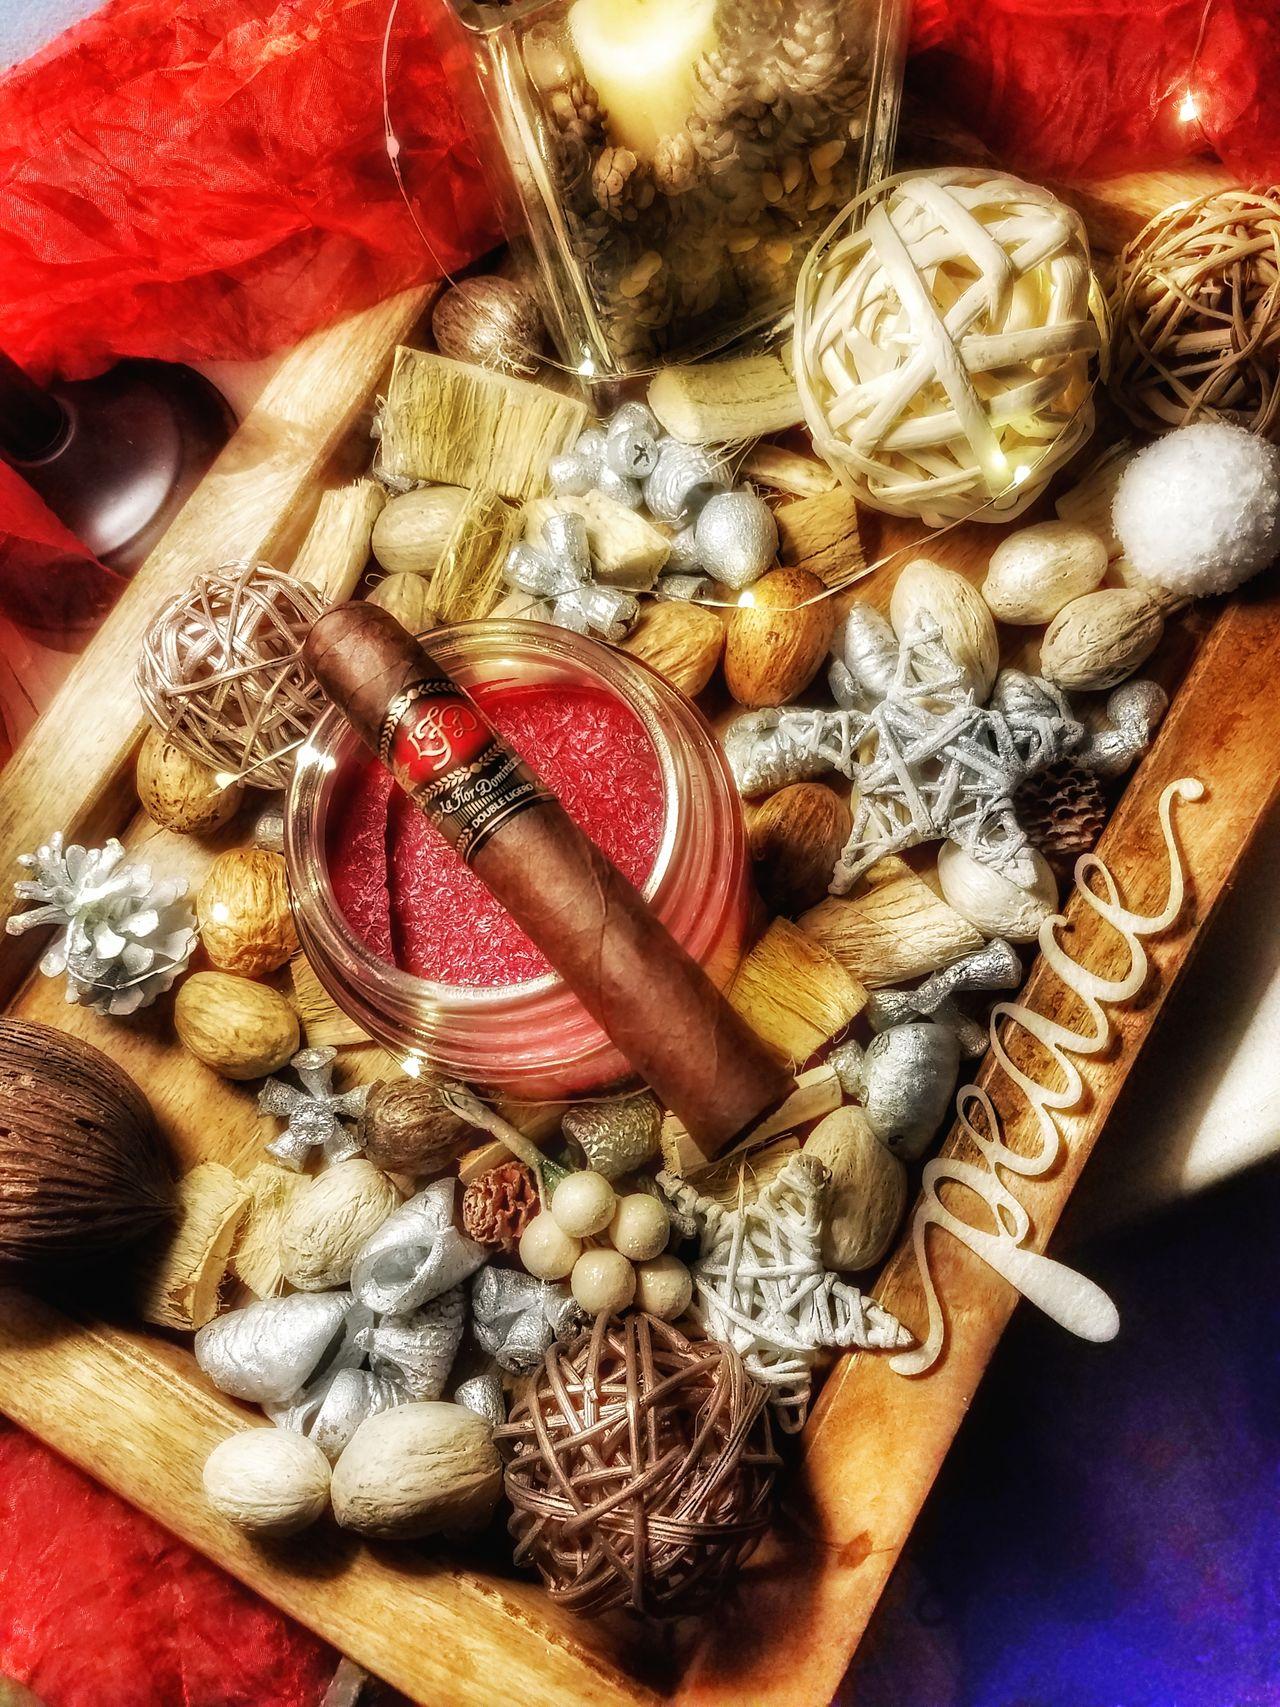 Cigars Cigarphotography Cigarart Holiday Holiday Spirit